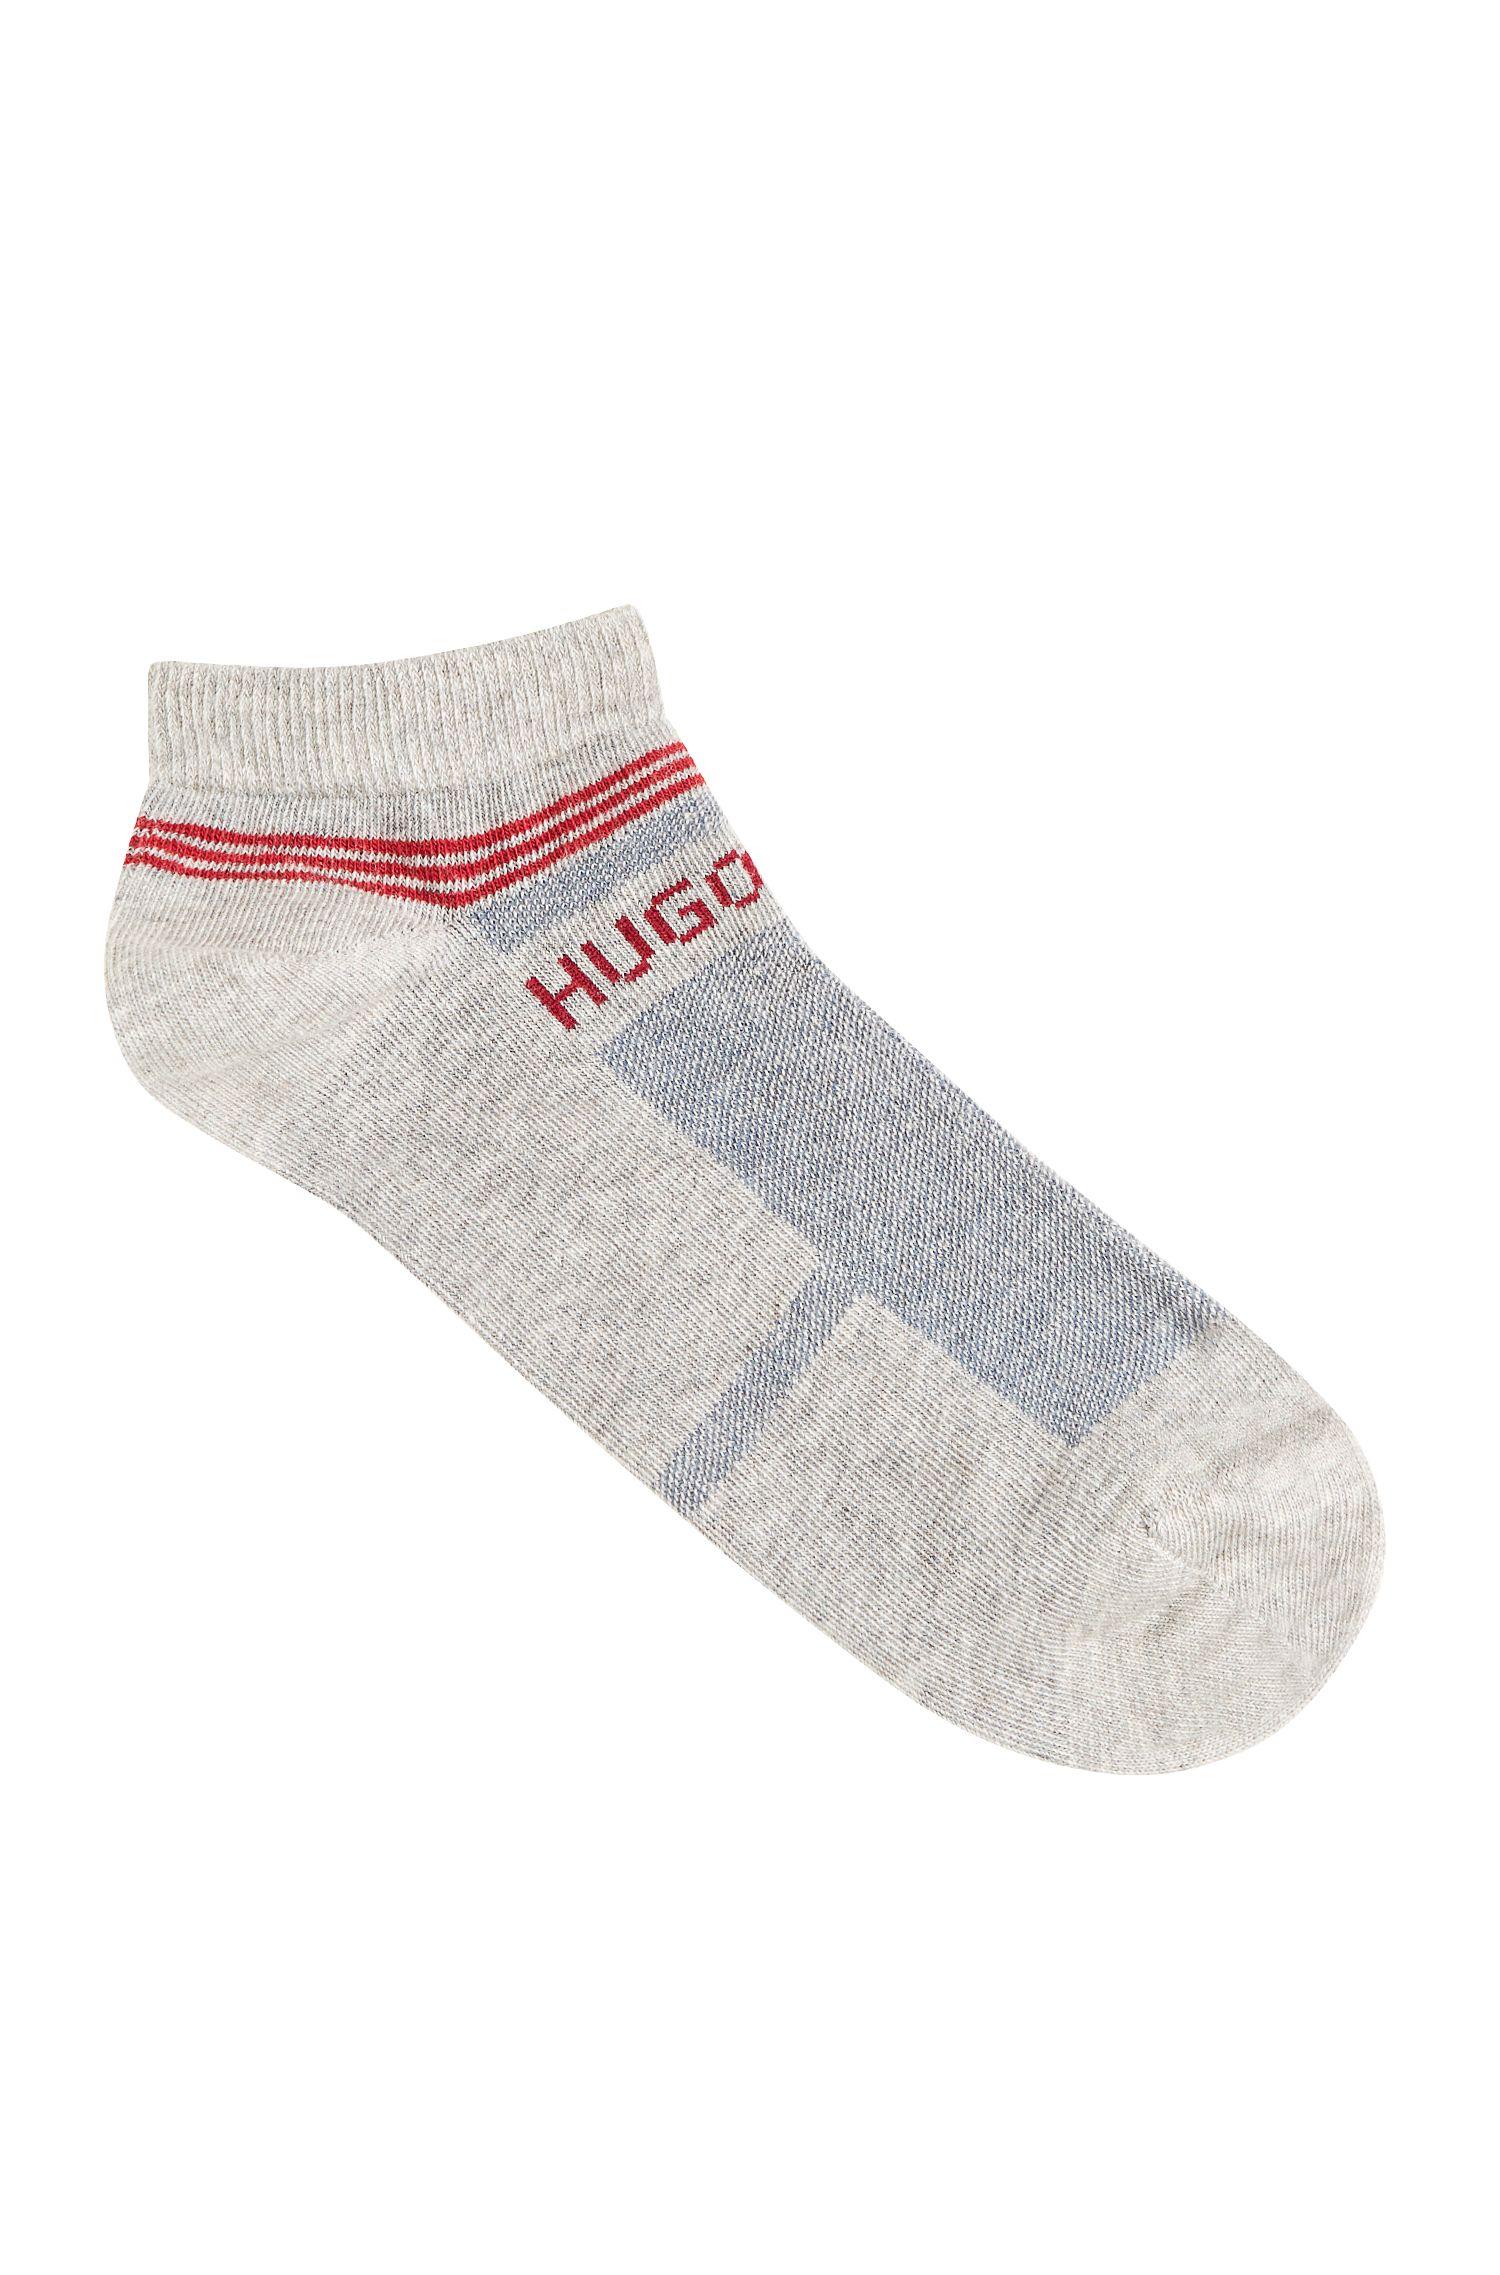 'AS Design US' | Stretch Cotton Blend Ankle Socks